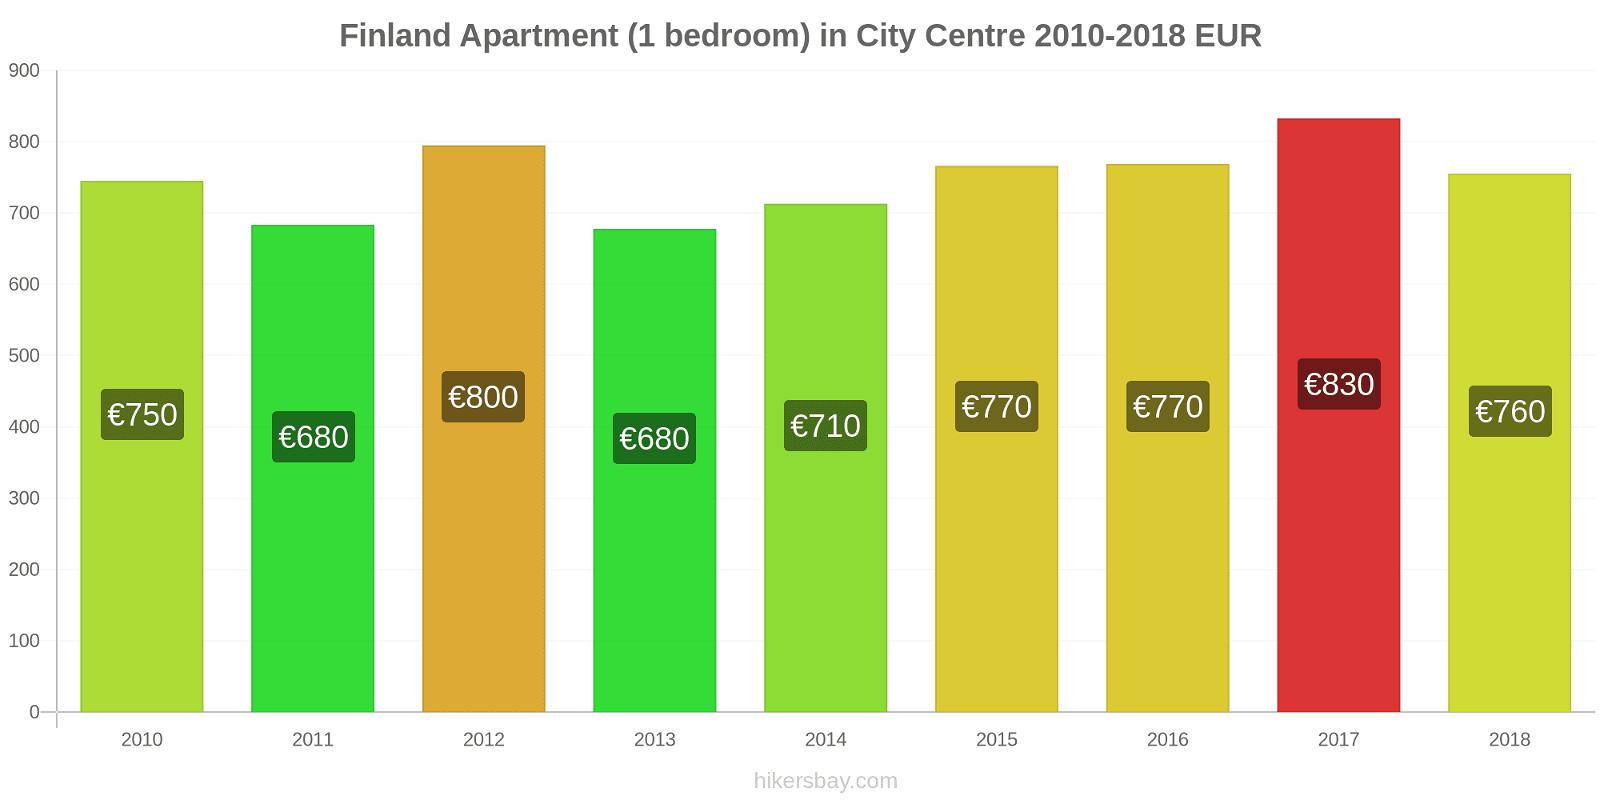 Finland price changes Apartment (1 bedroom) in City Centre hikersbay.com